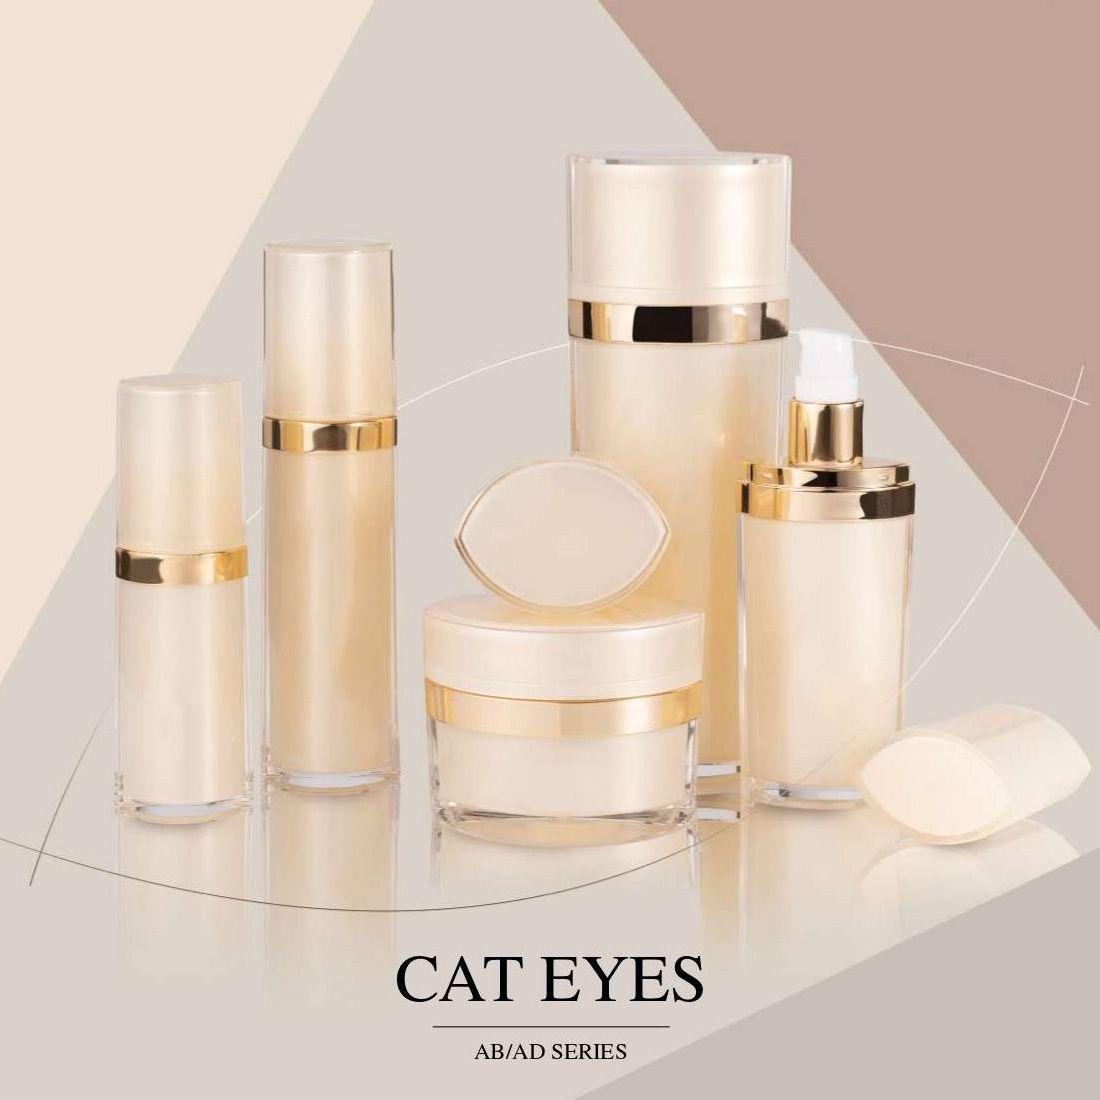 COSJAR cometic container design - Cat eyes series